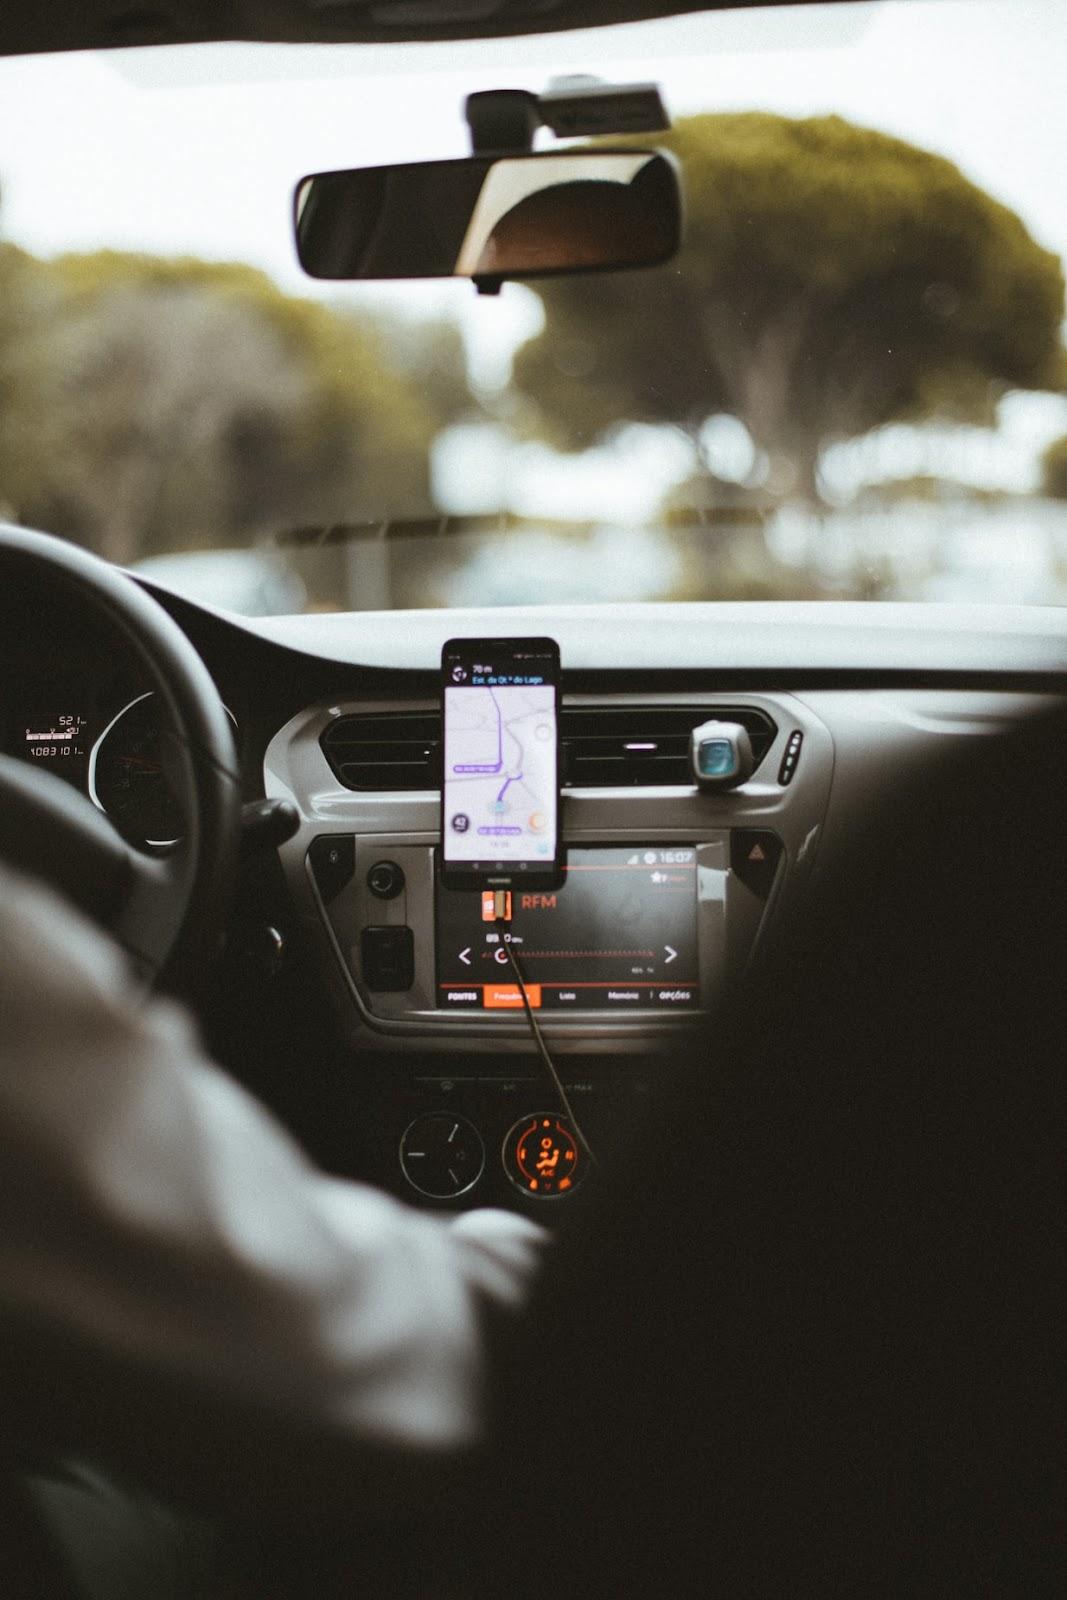 requisitos para ser uber en chile